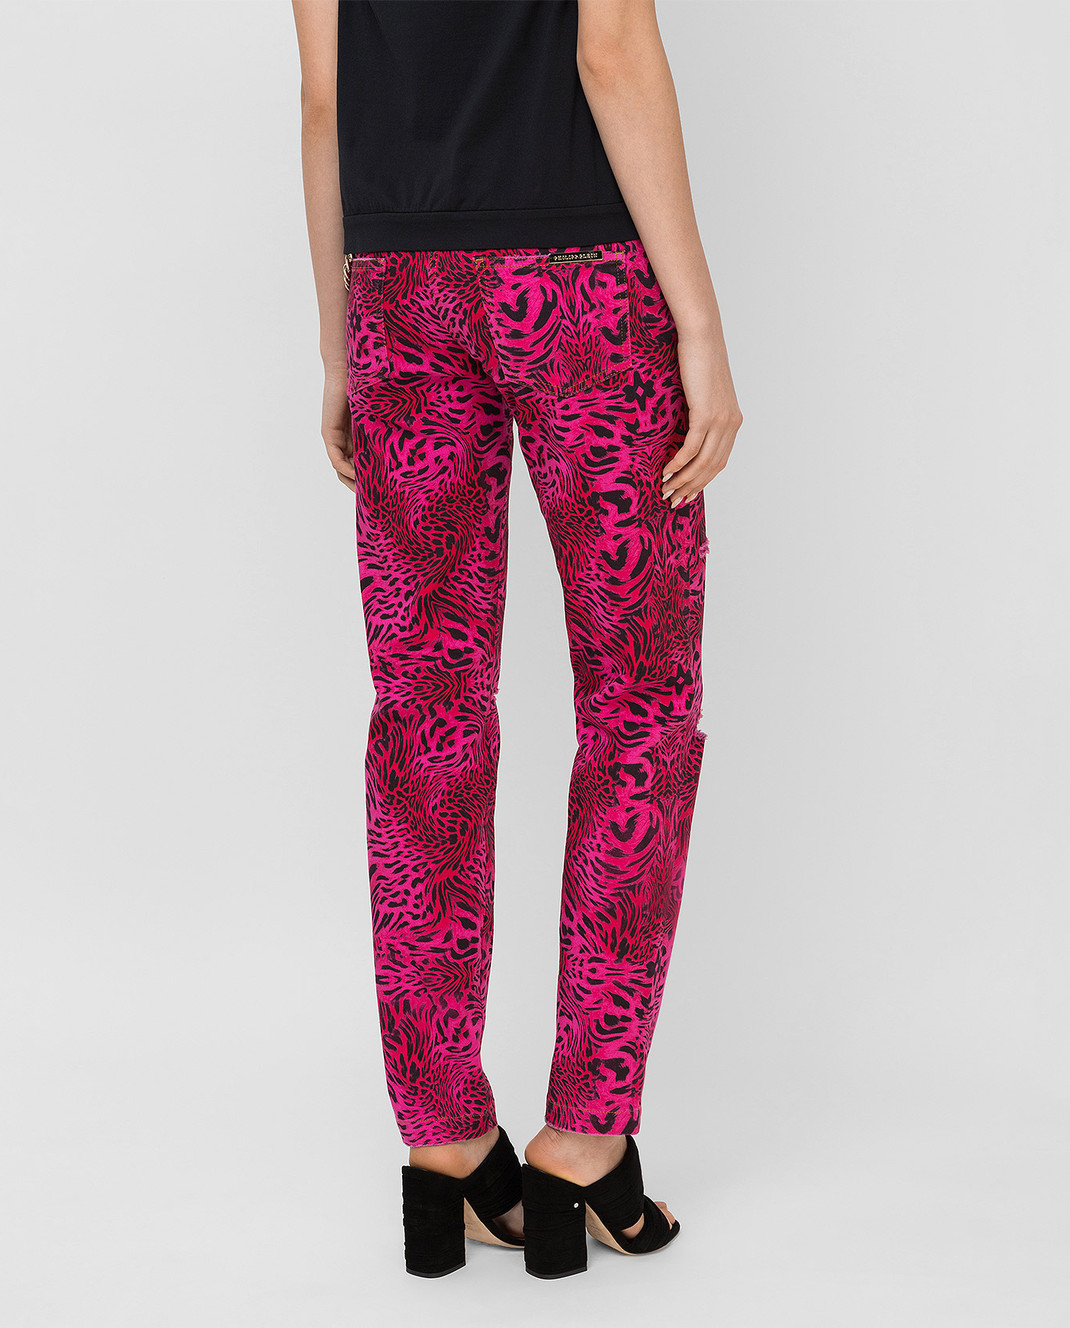 Philipp Plein Розовые джинсы CWDT0208 изображение 4